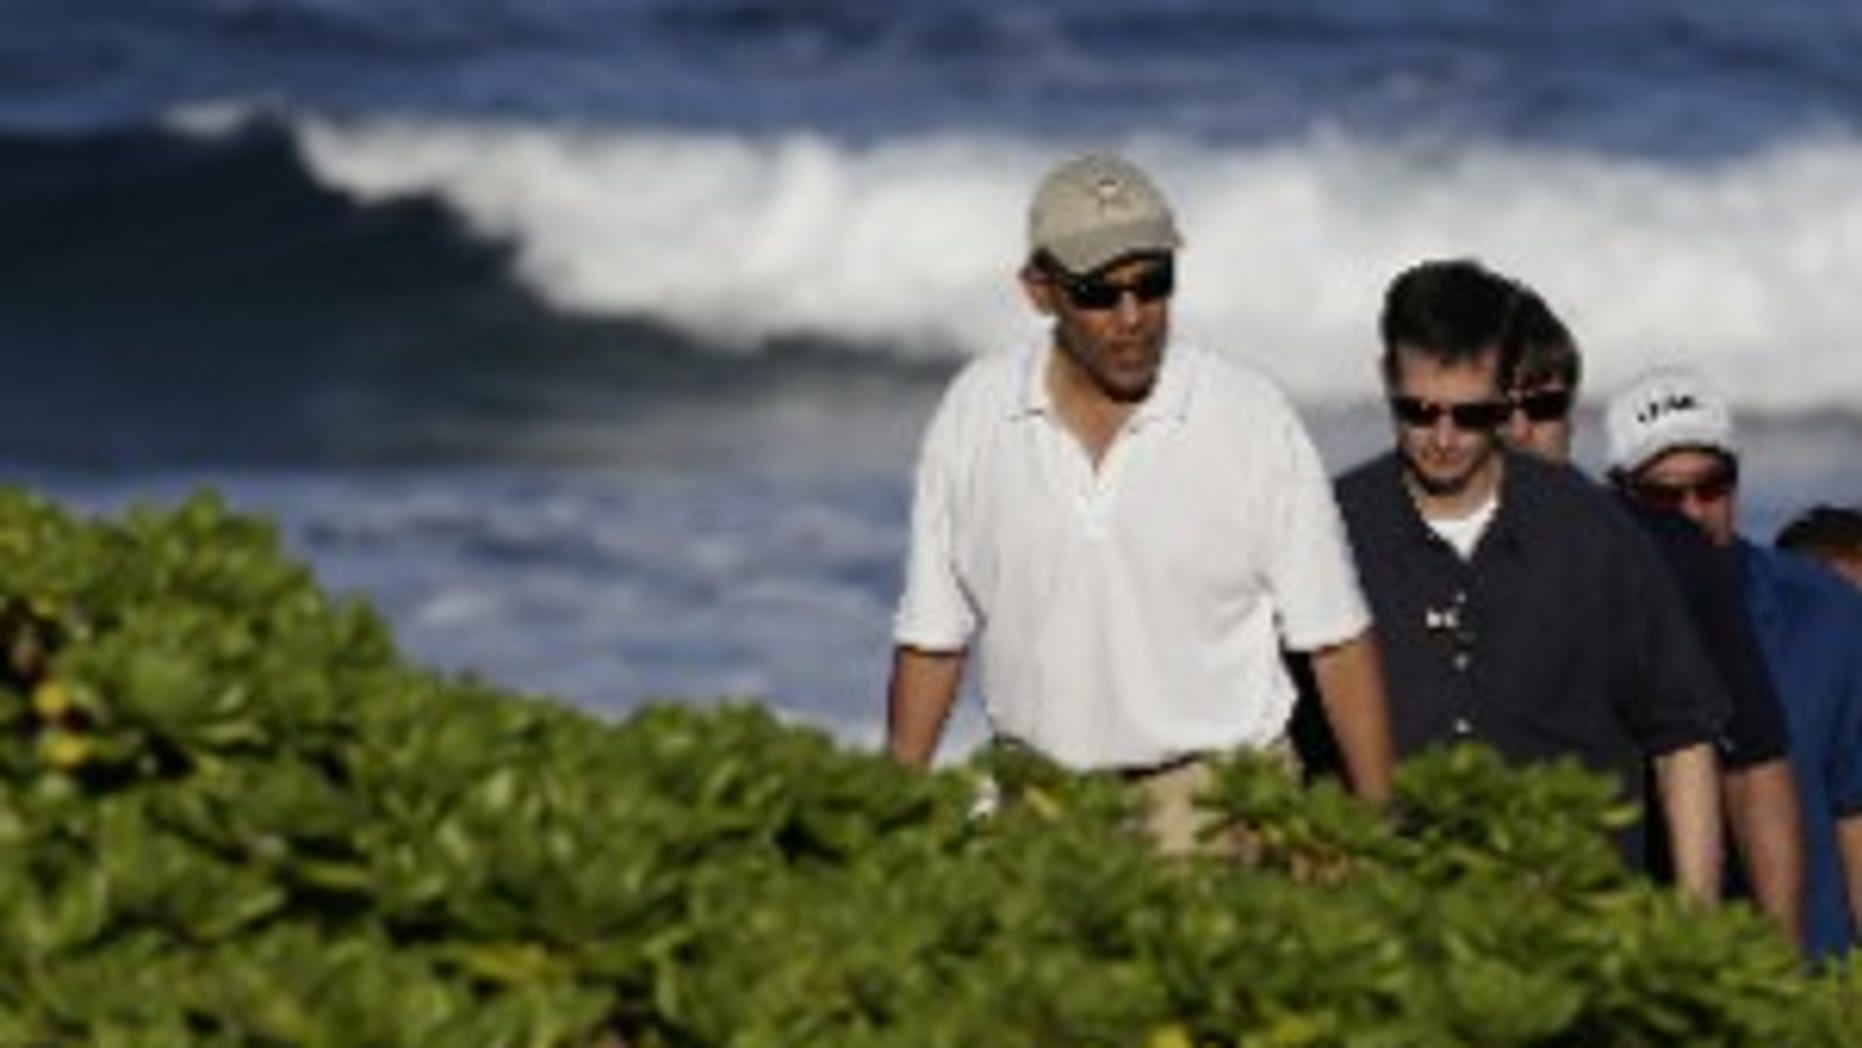 President Barack Obama, left, walks on Pyramid Rock beach on Marine Corps Base Hawaii in Kaneohe Bay, Hawaii Saturday, Dec. 26, 2009. The Obamas are in Hawaii for the holidays.(AP Photo/Alex Brandon)